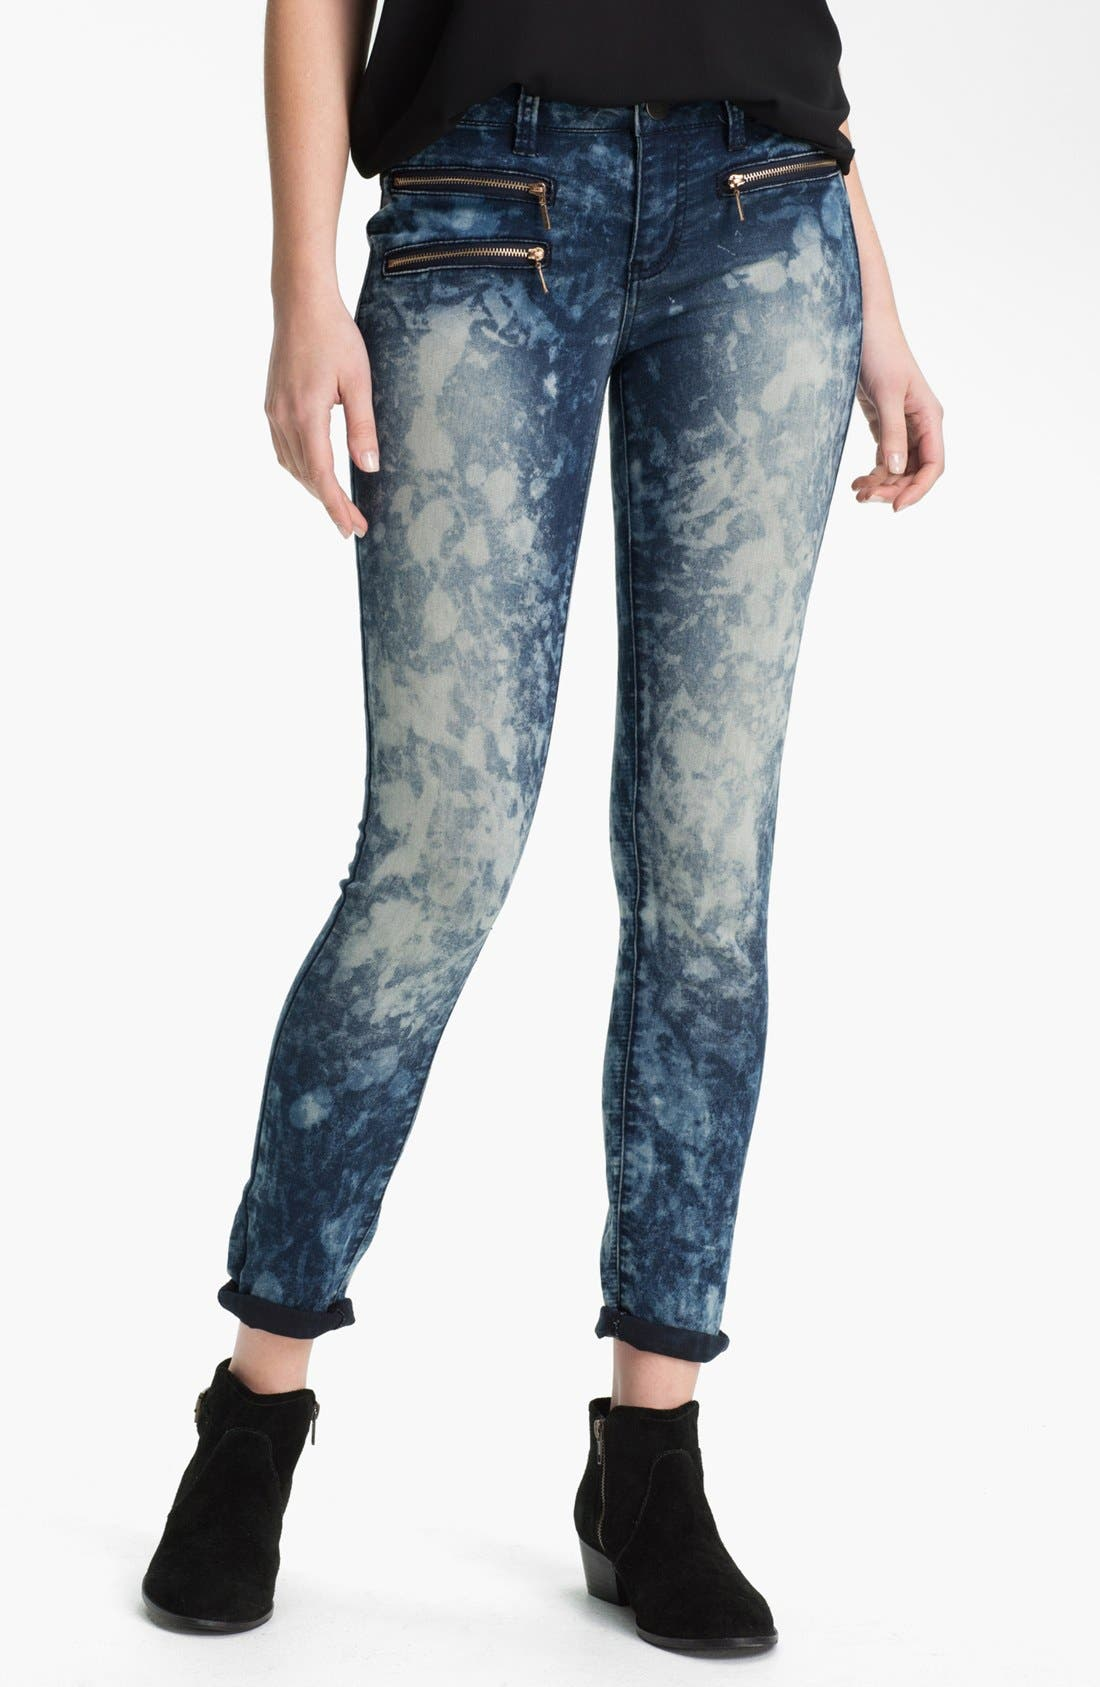 Alternate Image 1 Selected - Fire Acid Marble Skinny Biker Jeans (Juniors)